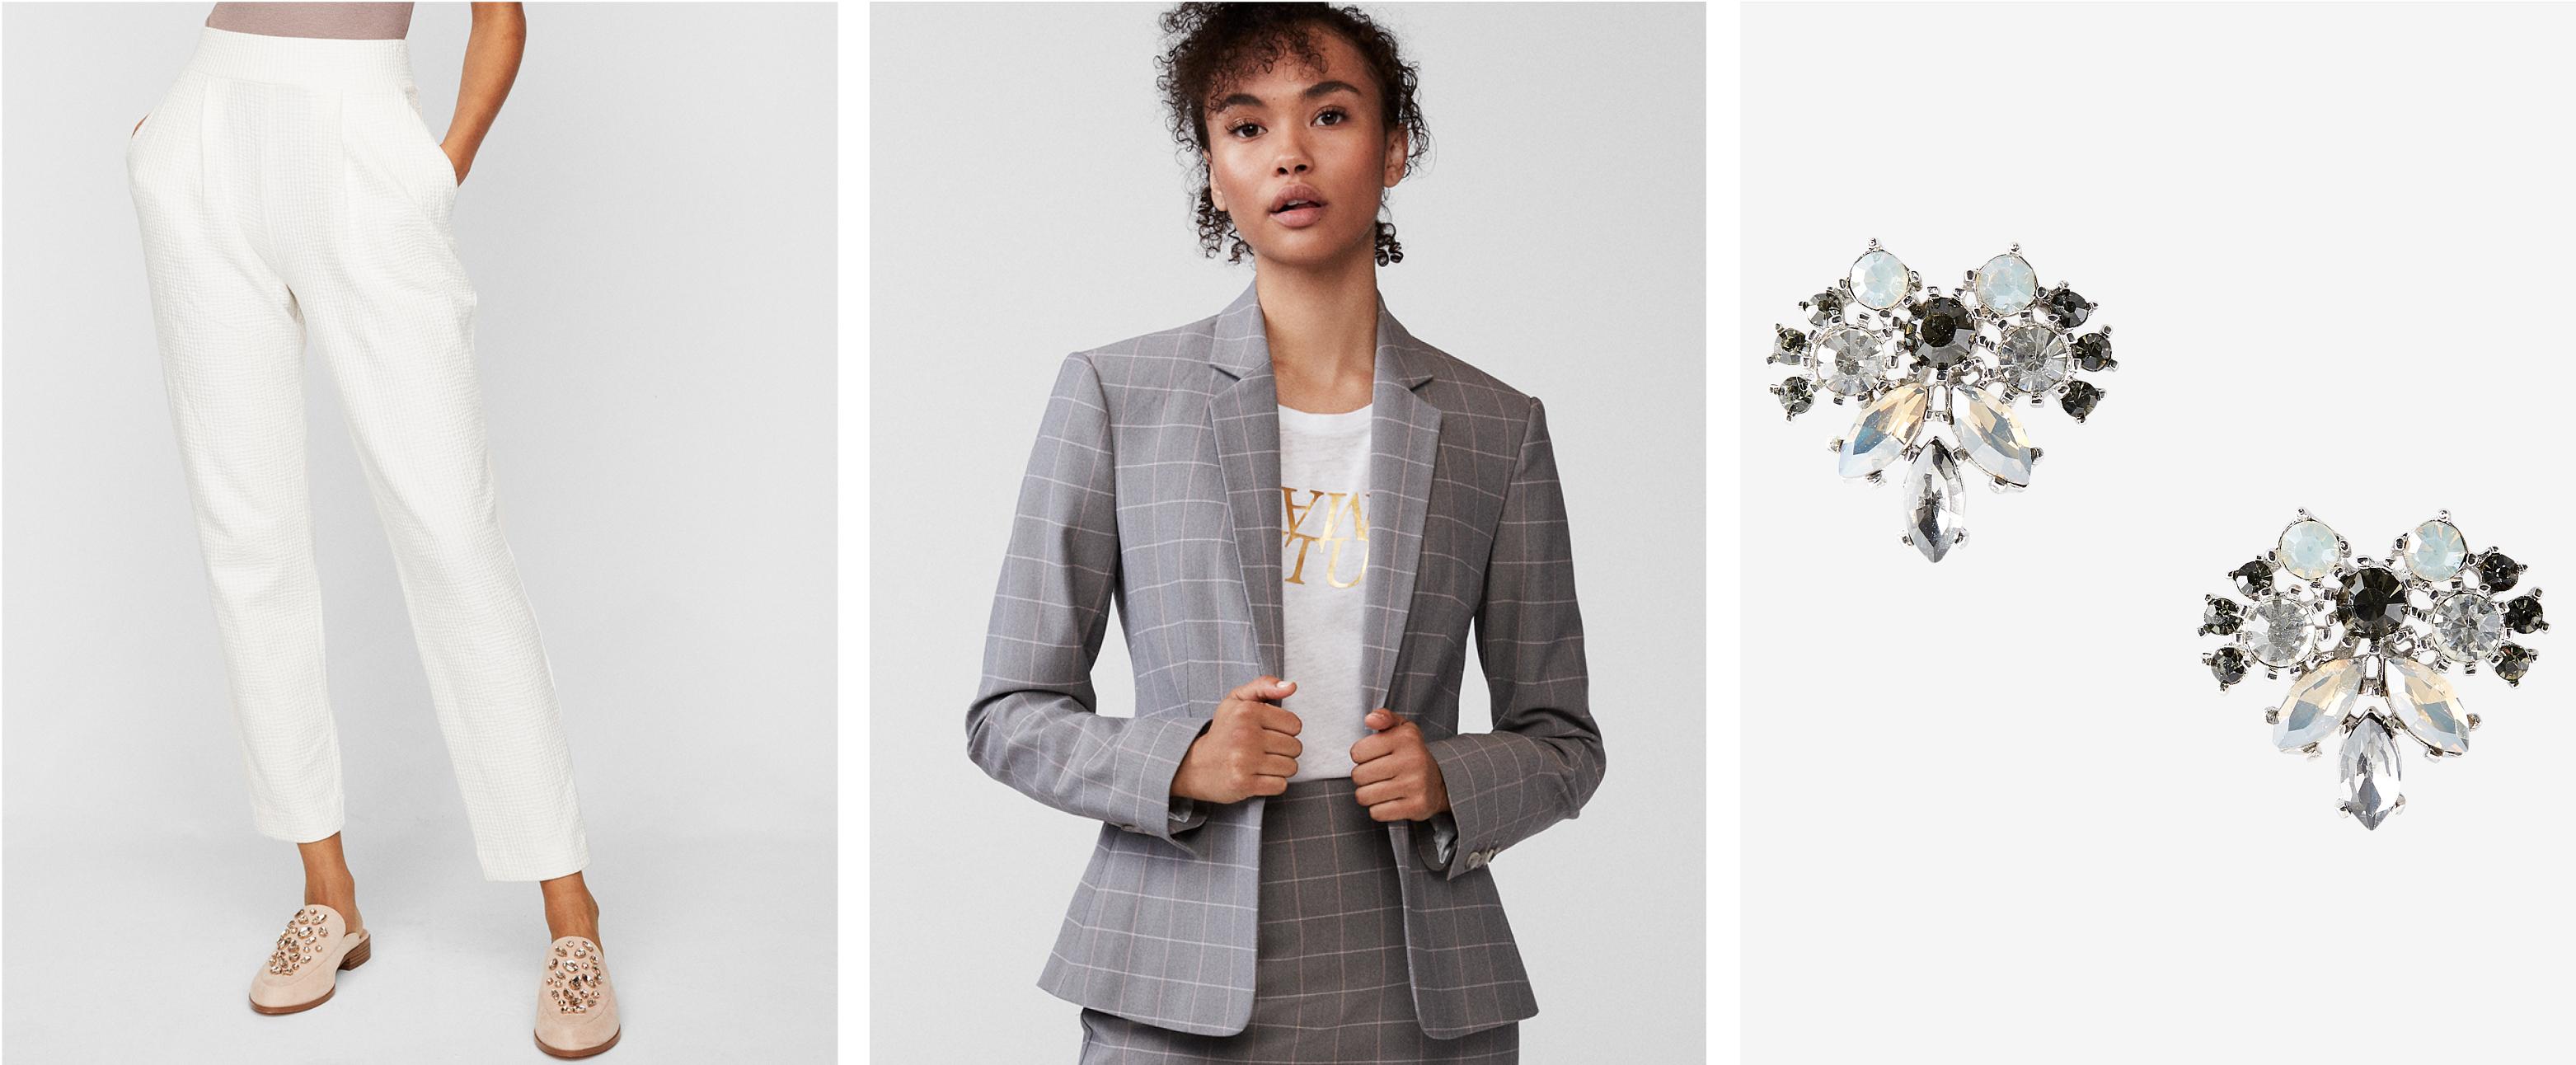 womens-ankle-pants-windowpane-blazer-embellished-earrings